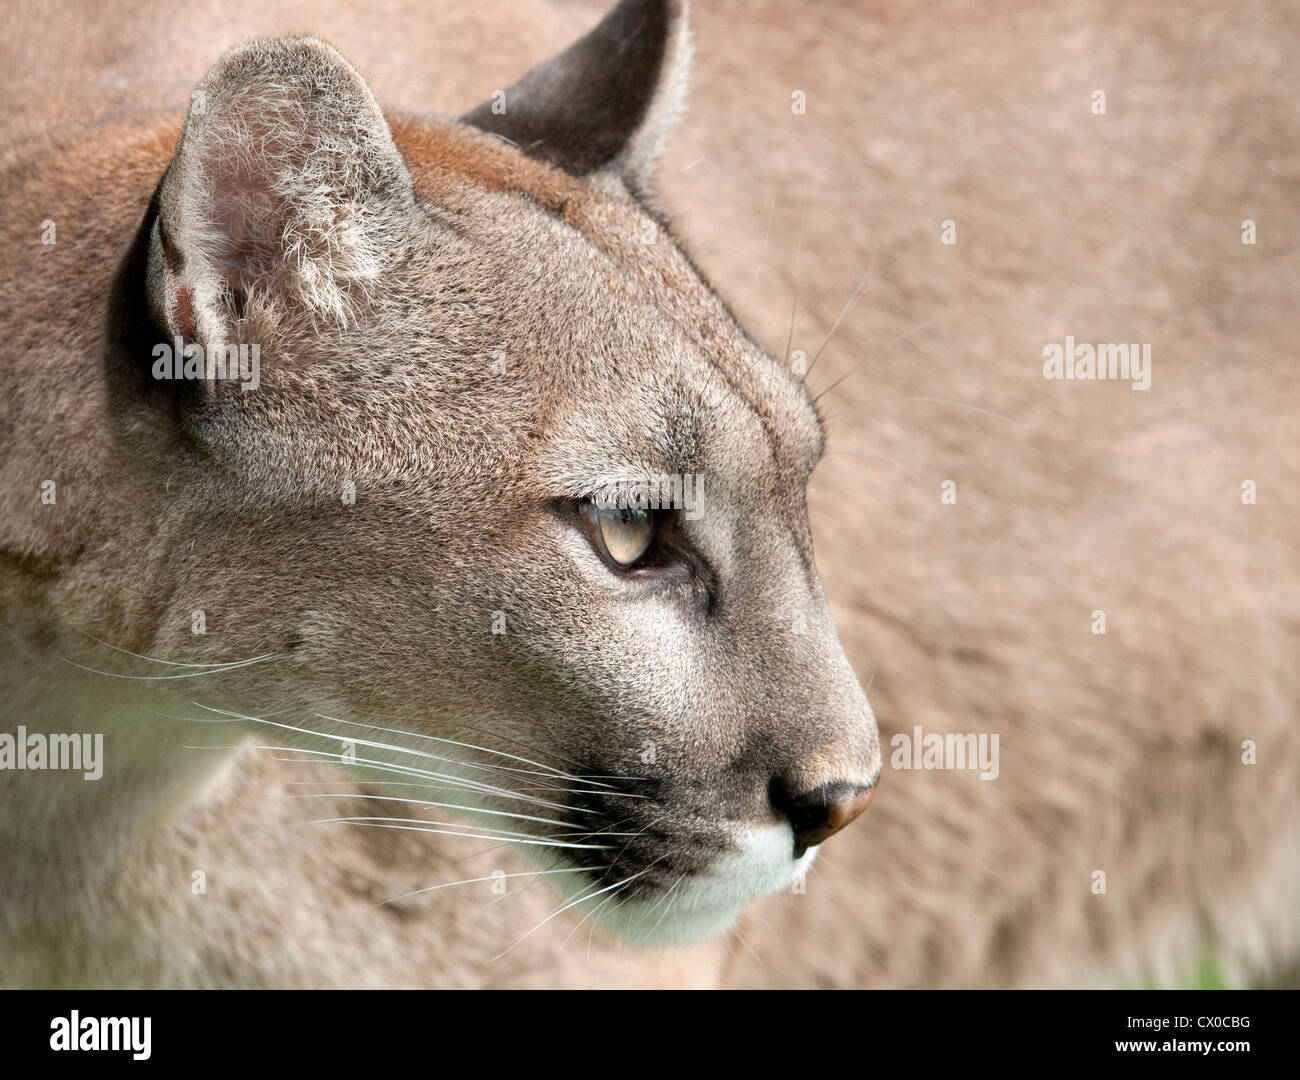 Puma Profil Stockfotos & Puma Profil Bilder Alamy